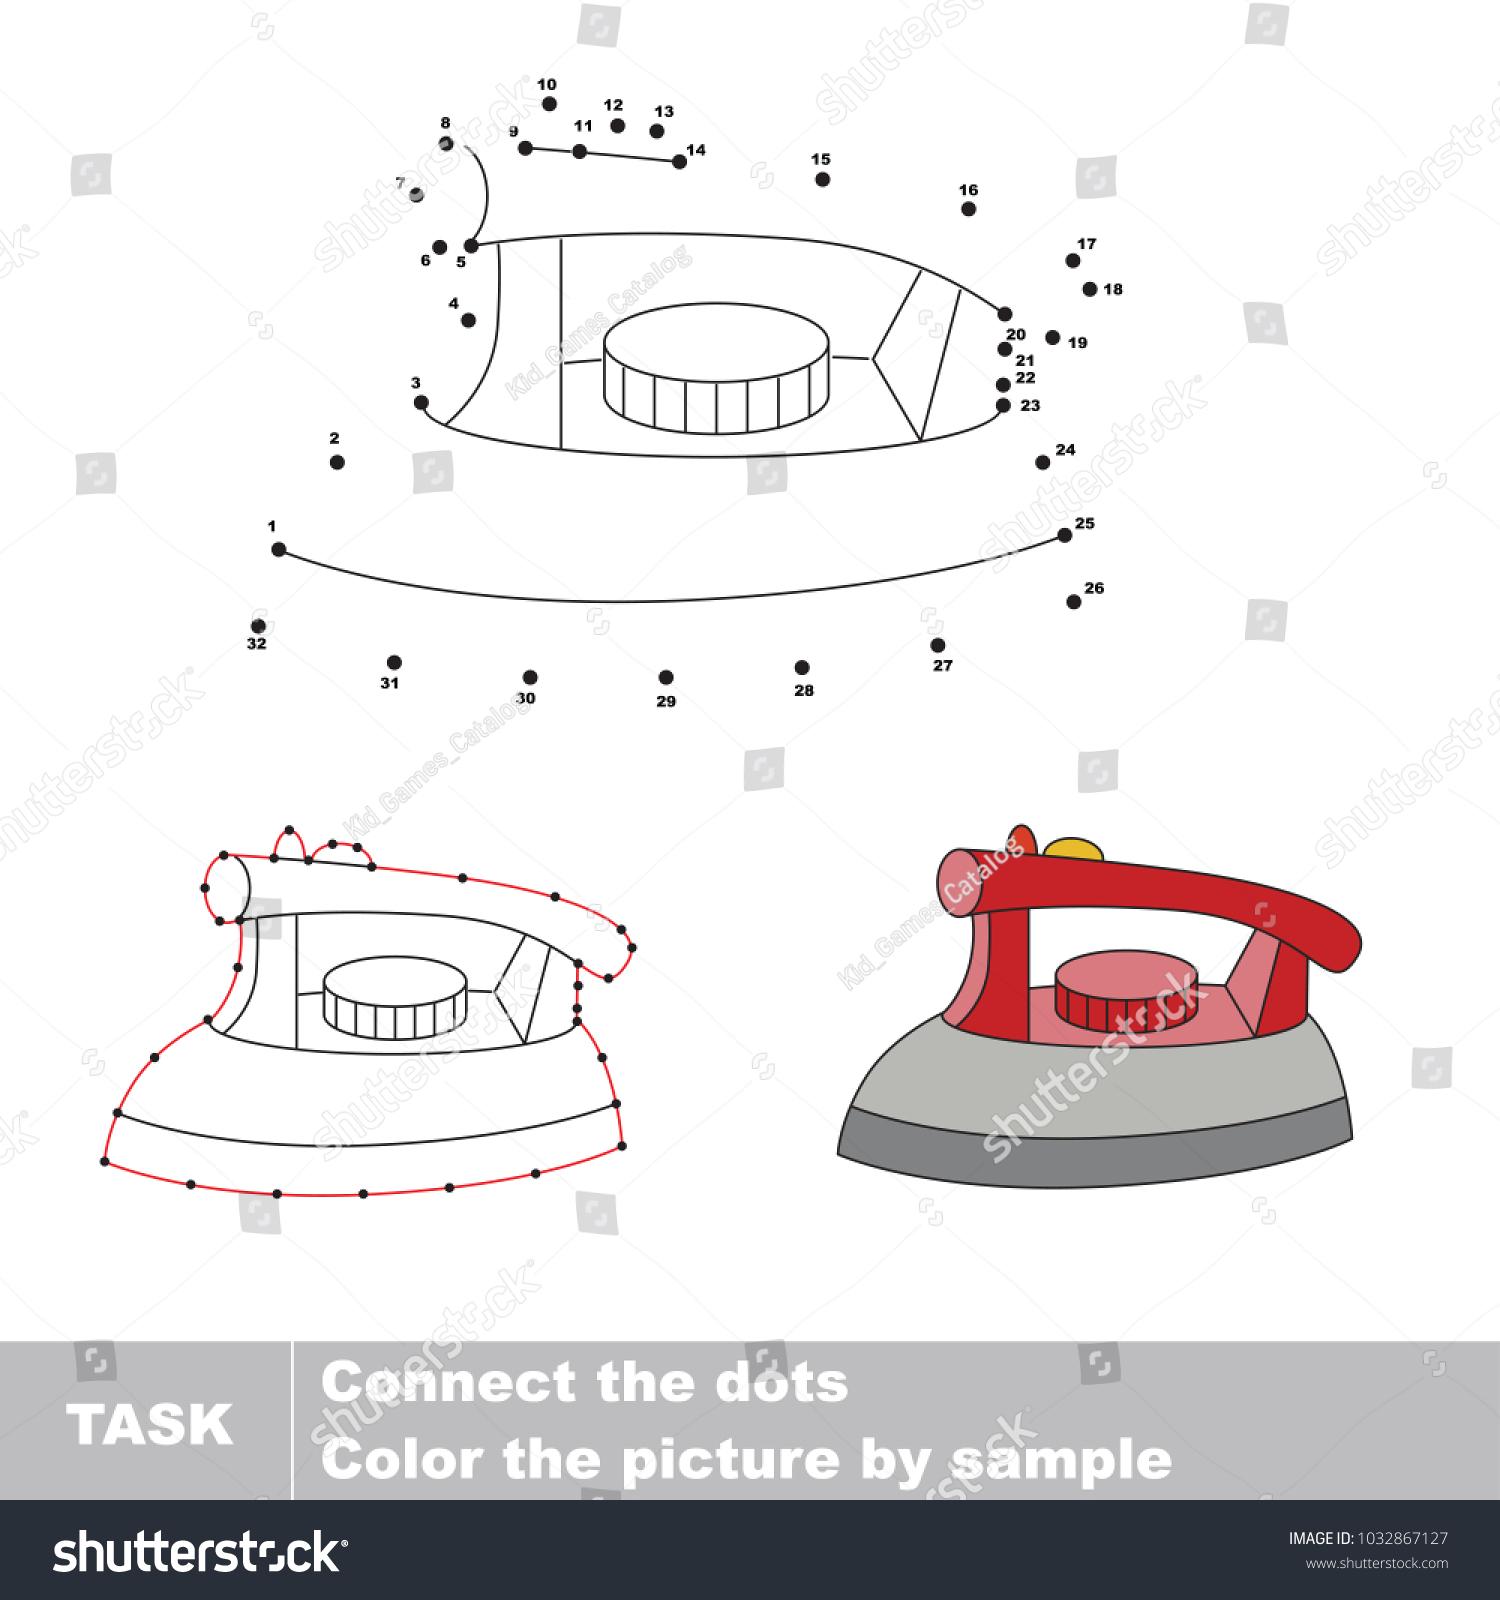 Iron dot diagram free download wiring diagrams iron dot dot educational game kids stock vector 1032867127 iron dot to dot educational game for kids at actinium dot diagram pooptronica Images